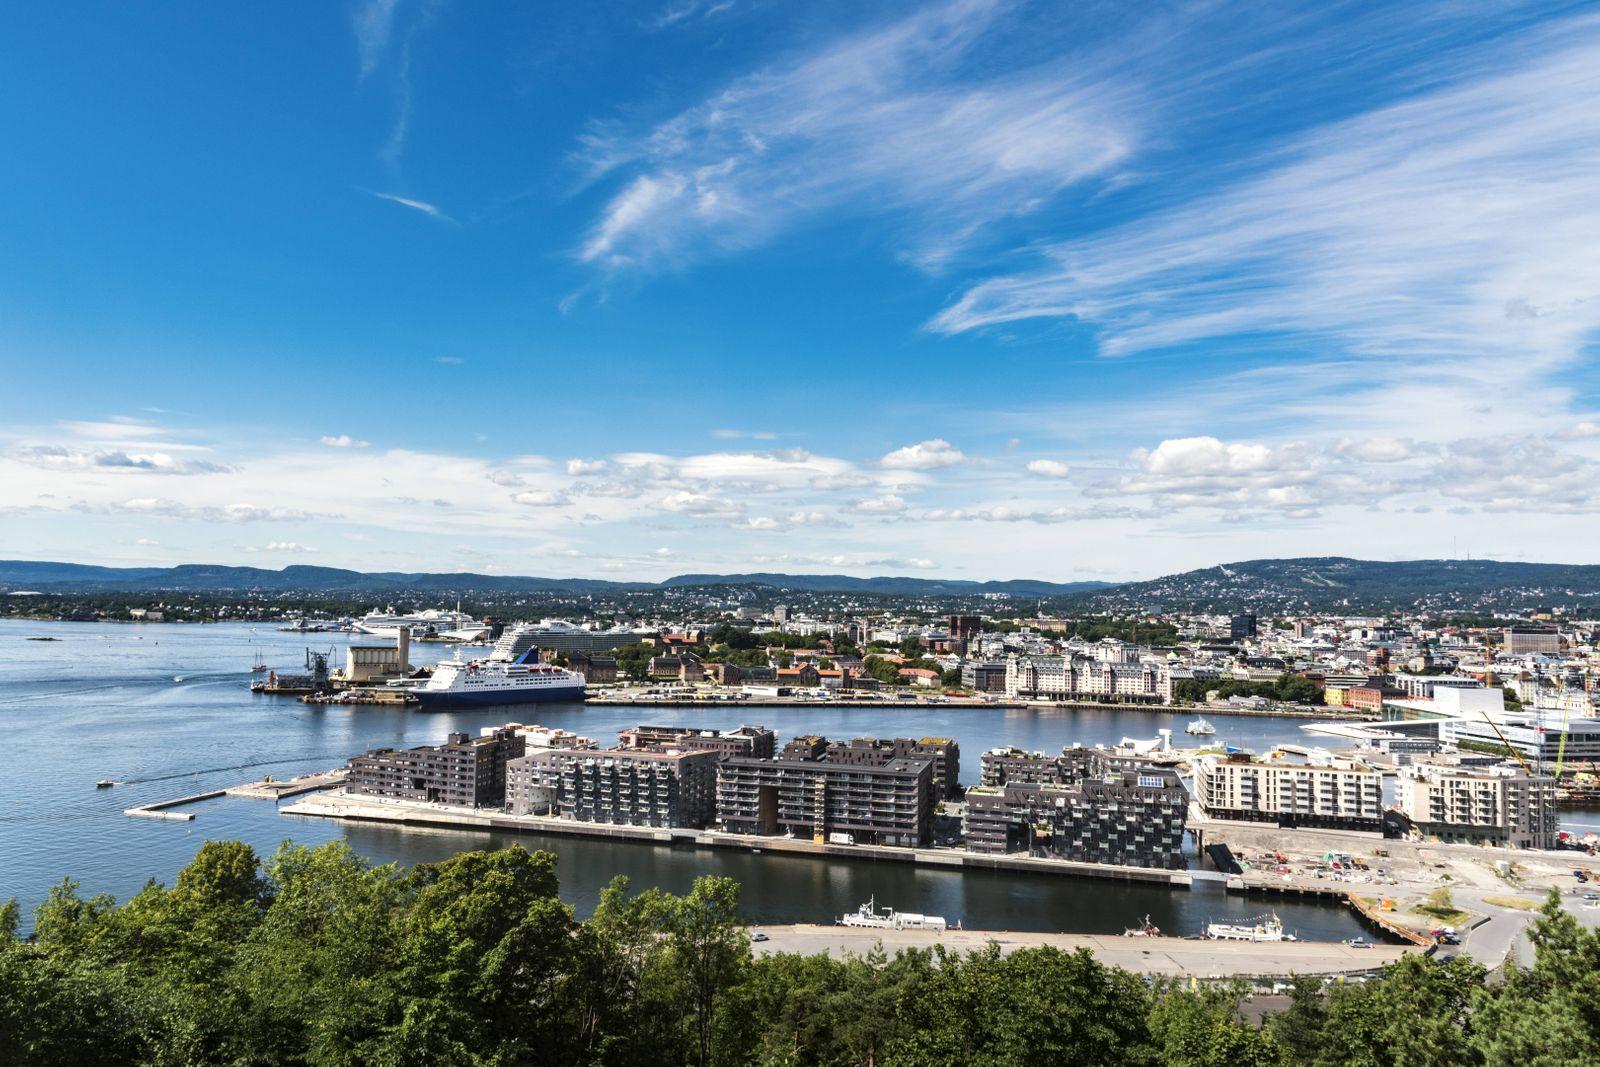 Norway Oslo Sorengkai and ferry port at Oslo fjord PUBLICATIONxINxGERxSUIxAUTxHUNxONLY CSTF001174